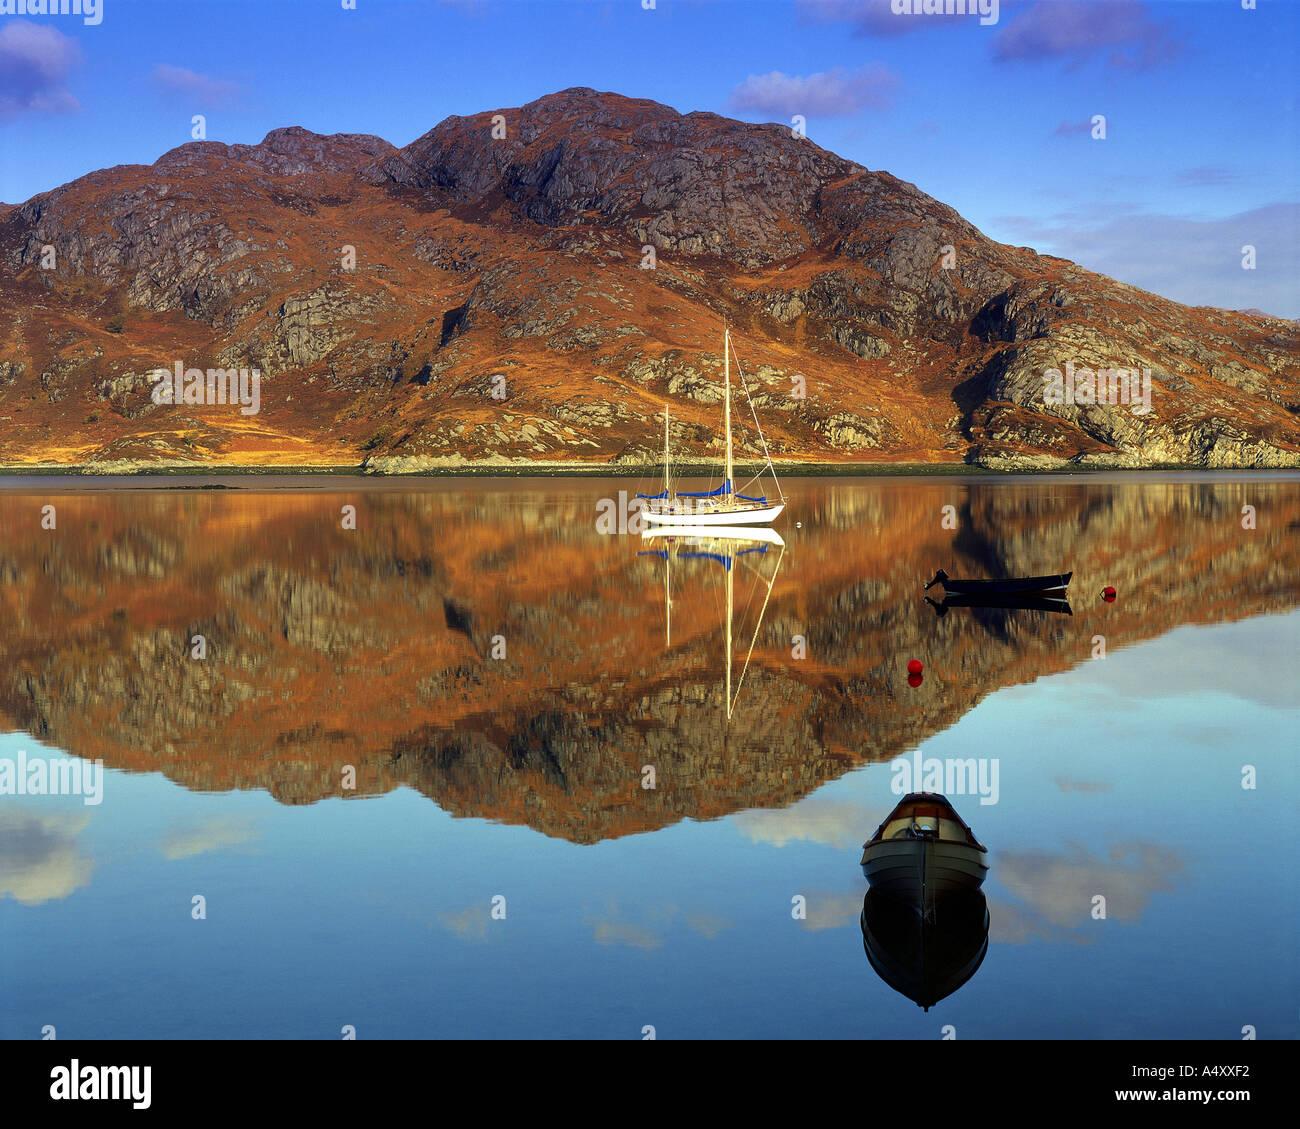 GB - Scozia: Loch Ailort nelle Highlands Foto Stock